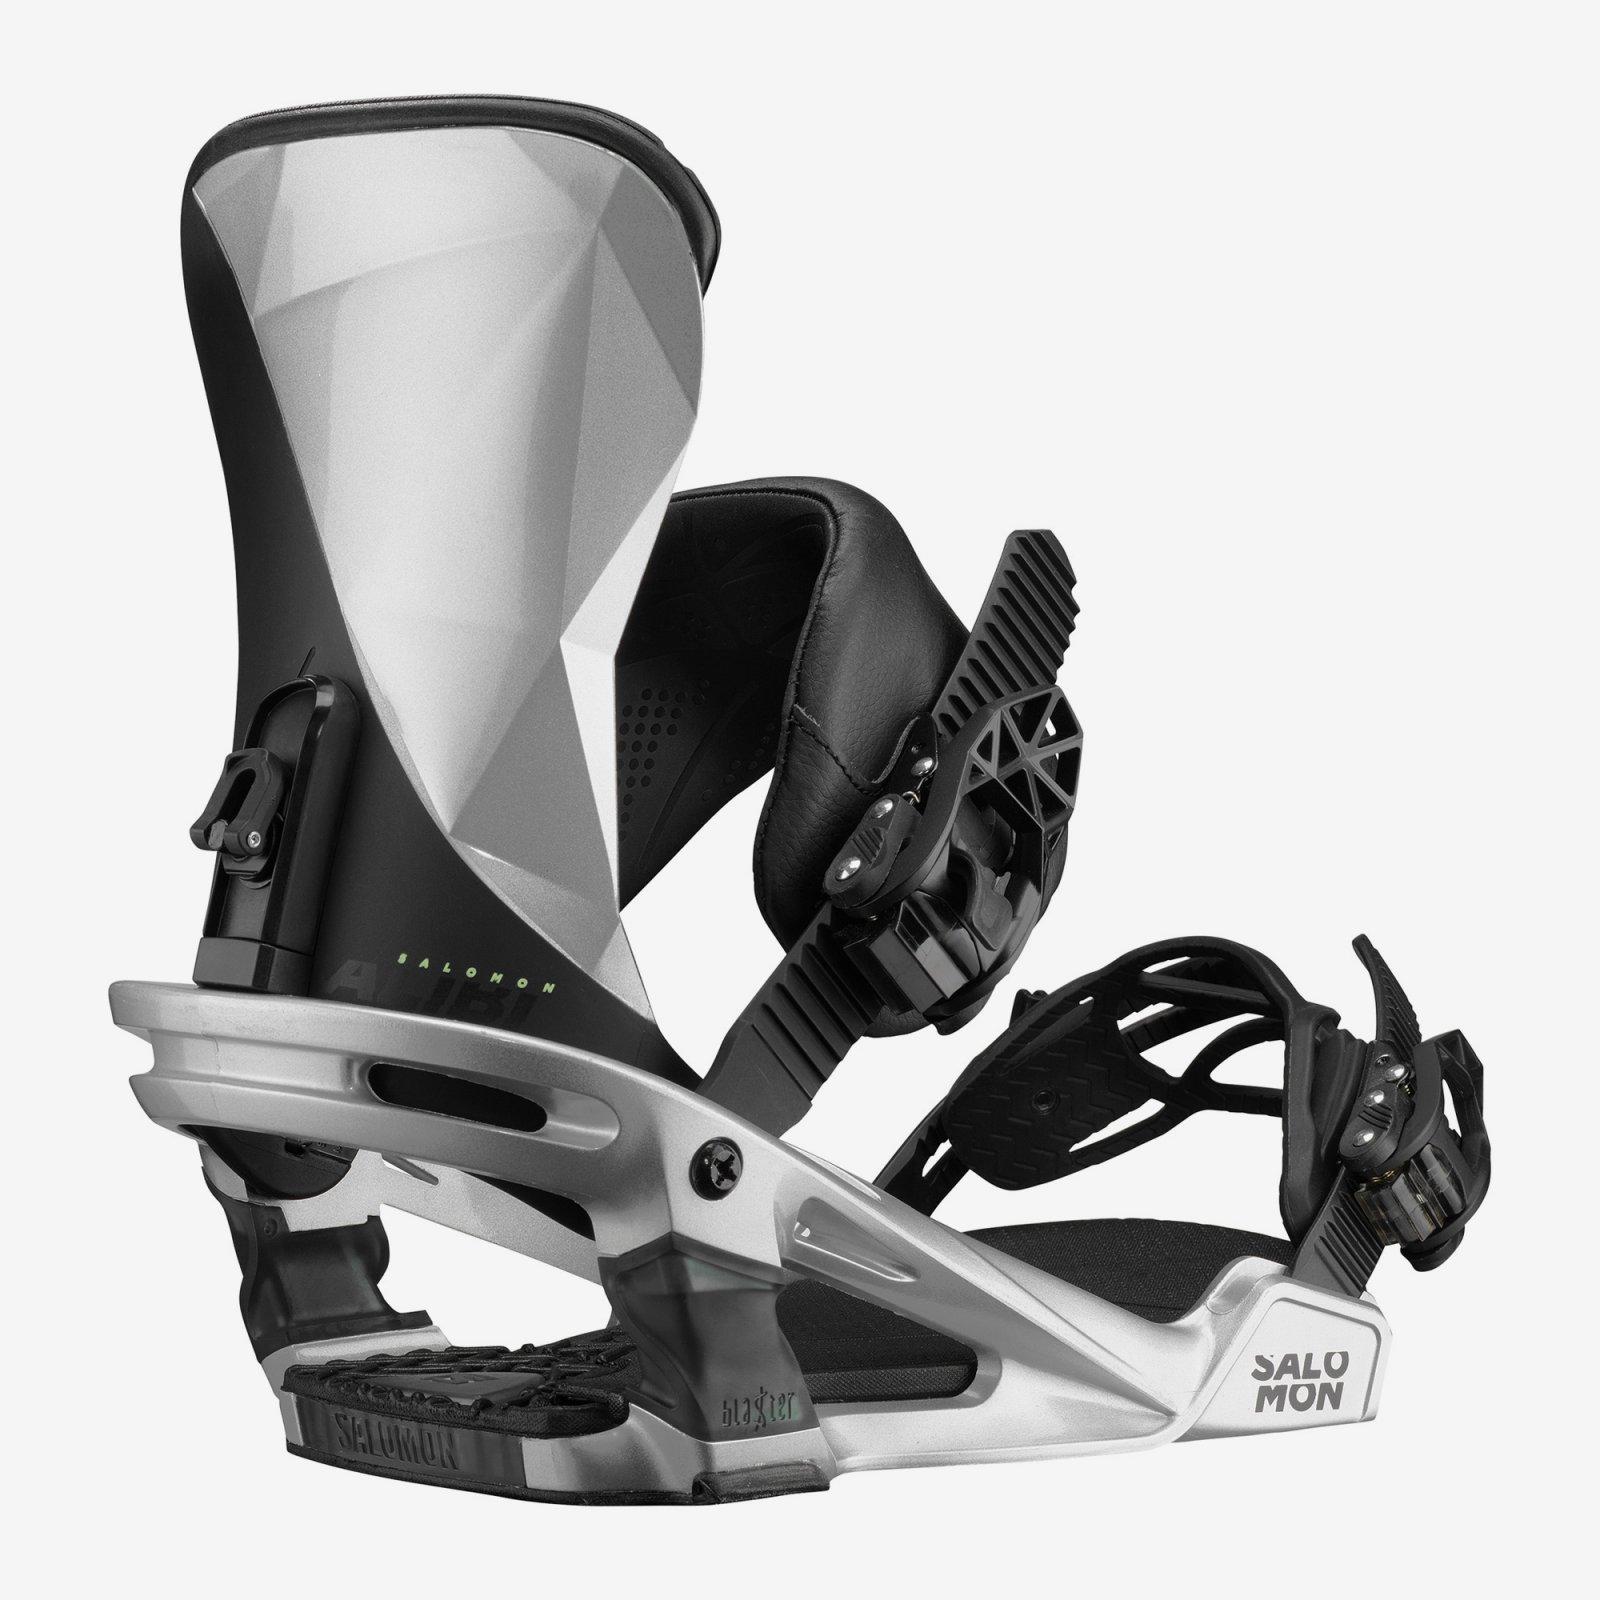 2020 Salomon Alibi Men's Snowboard Bindings